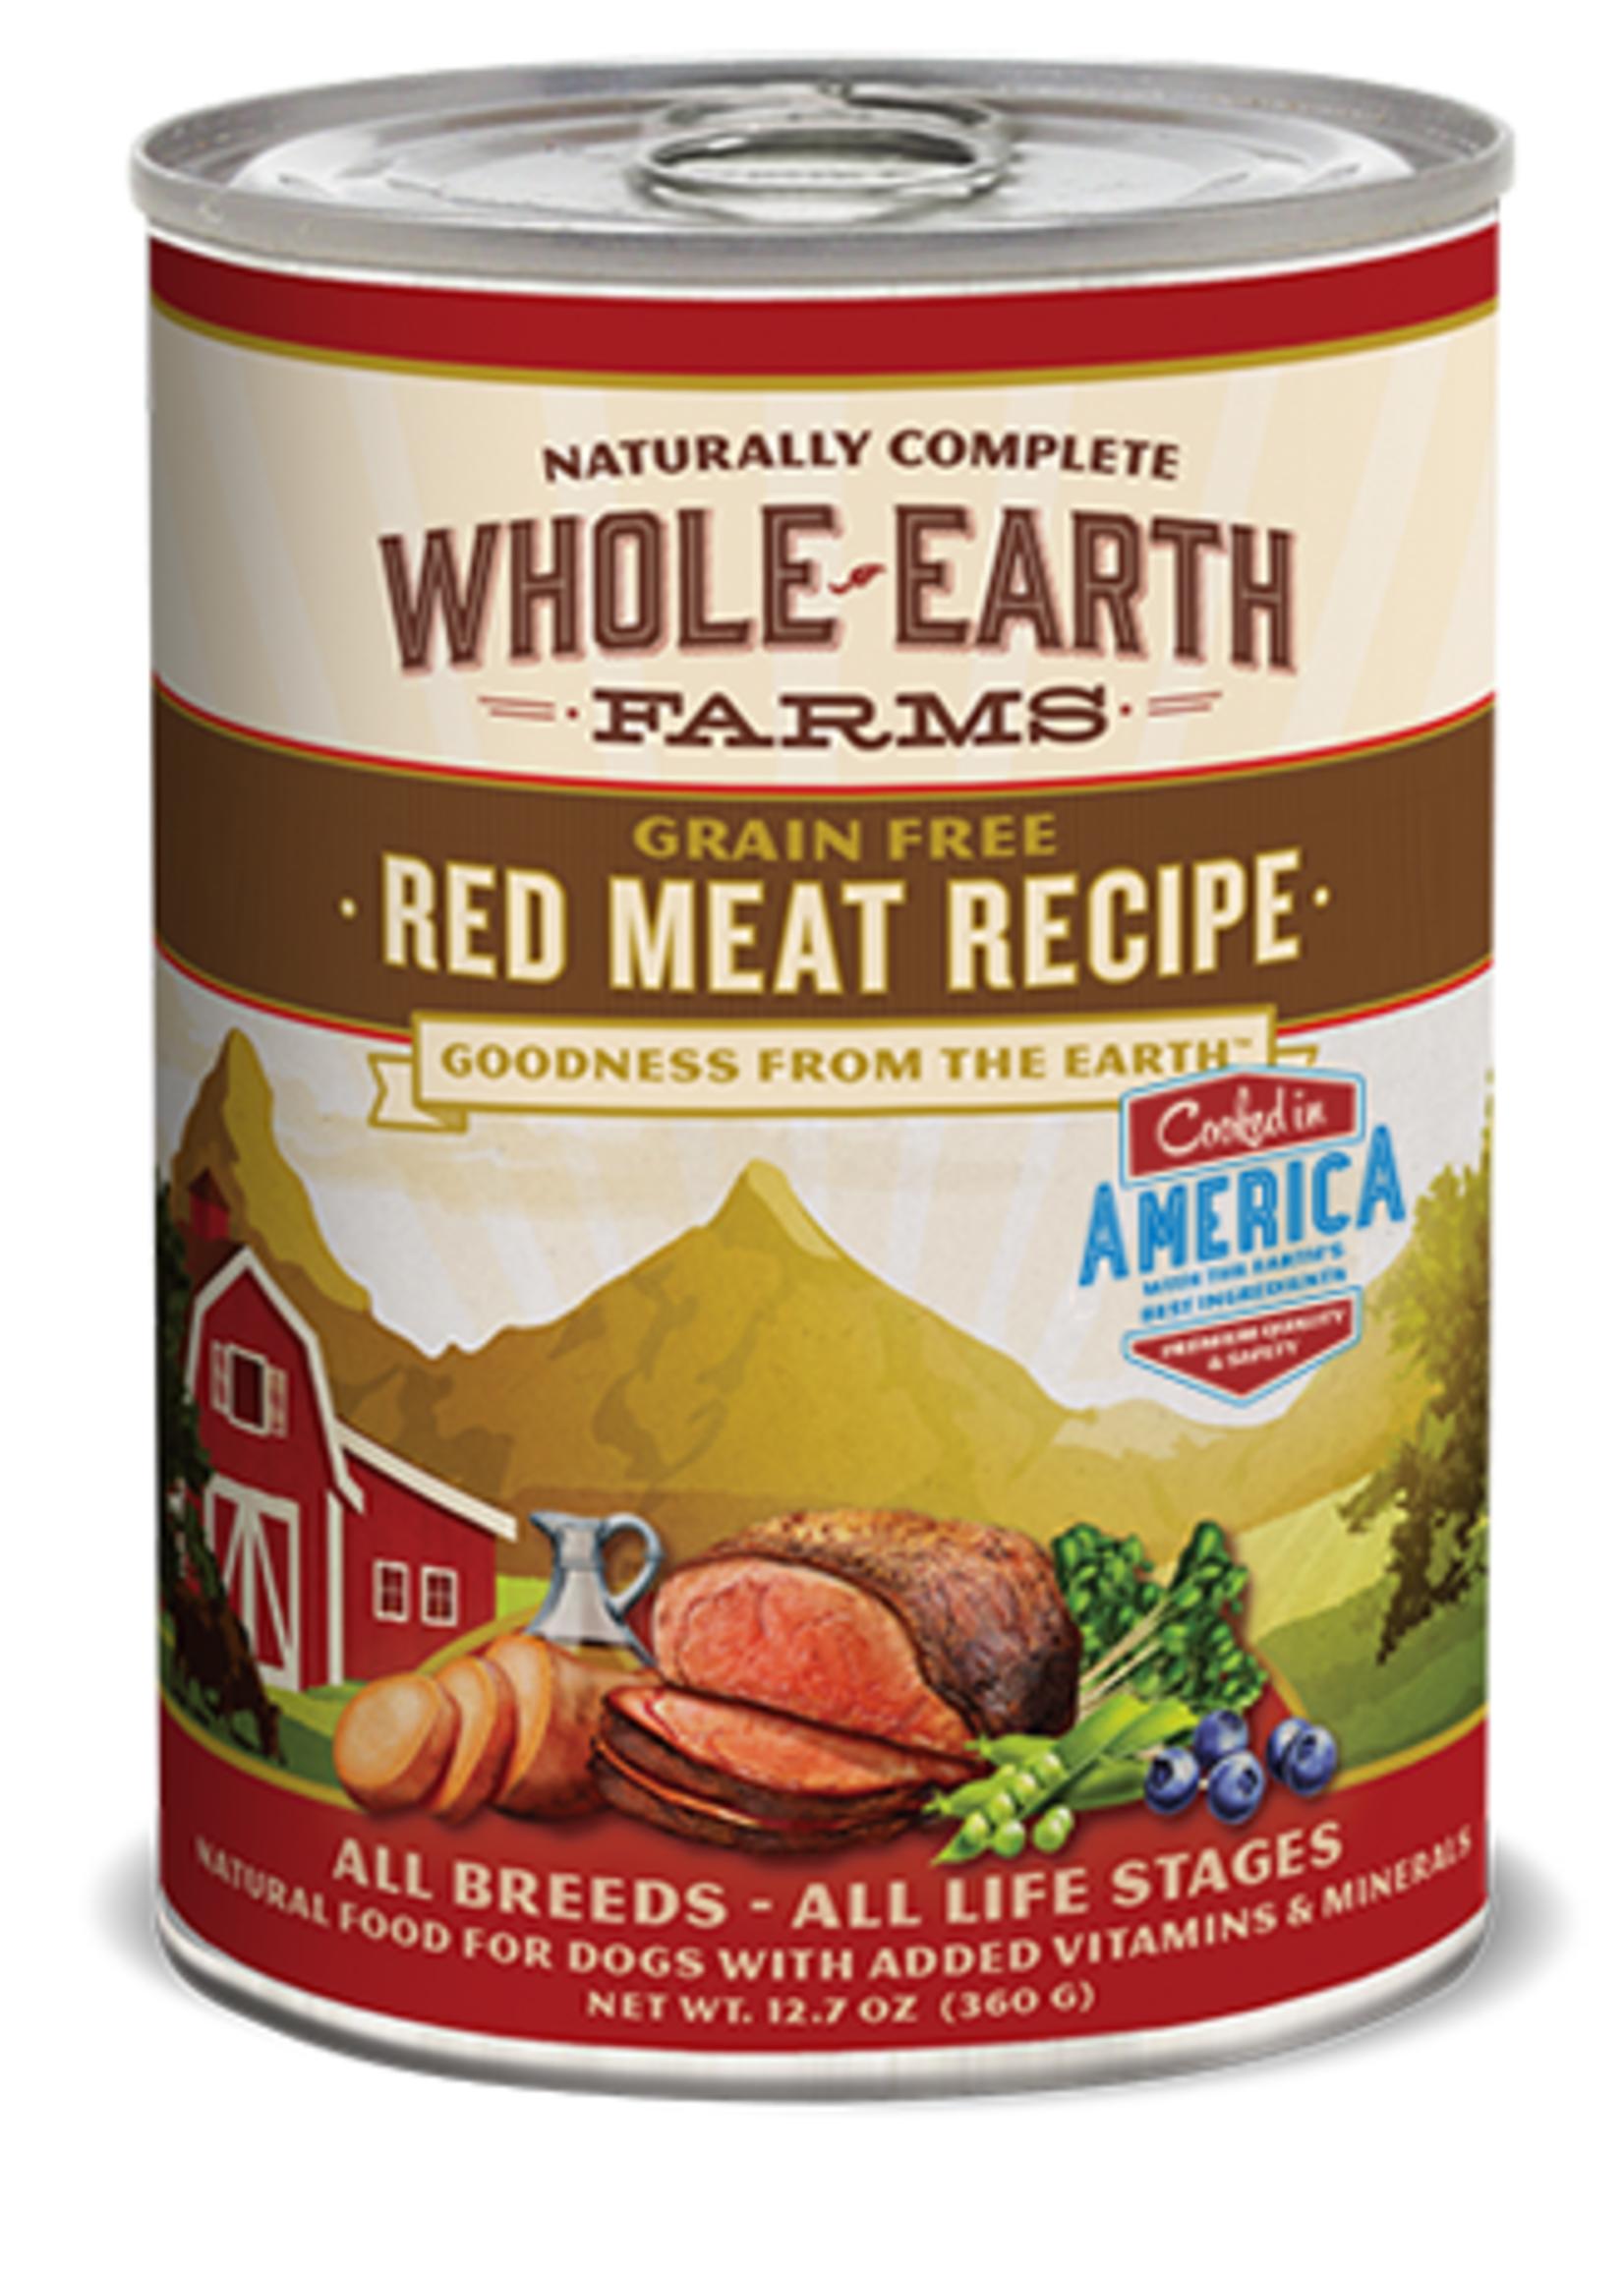 Merrick® WHOLE EARTH FARMS GRAIN FREE RED MEAT RECIPE 12.7oz